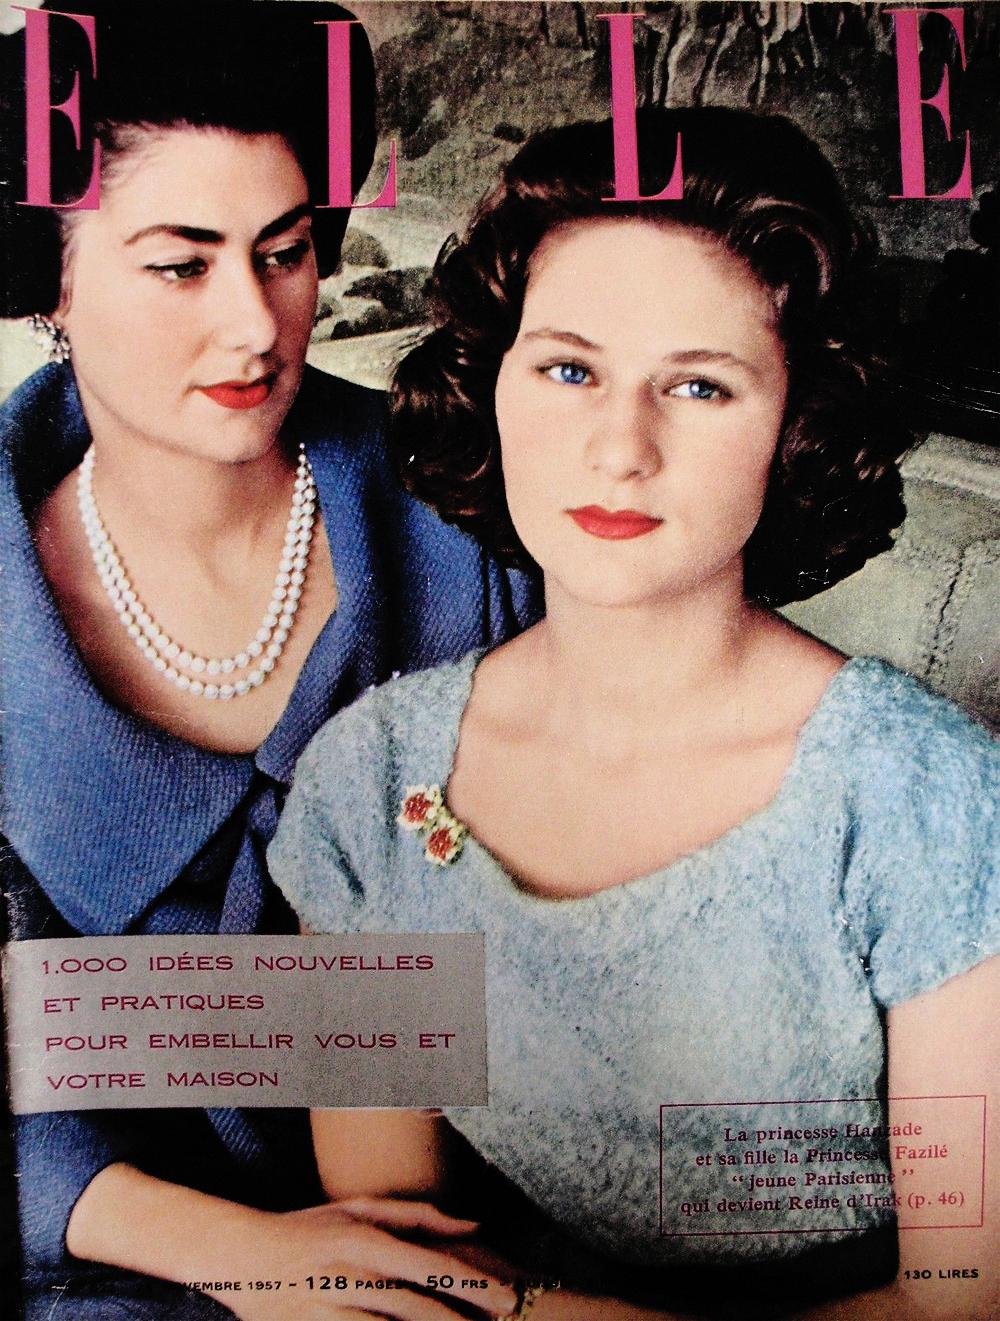 Alice Eve (born 1982),Joyce Windsor Erotic picture Hina Shaheen,Sasha Allen